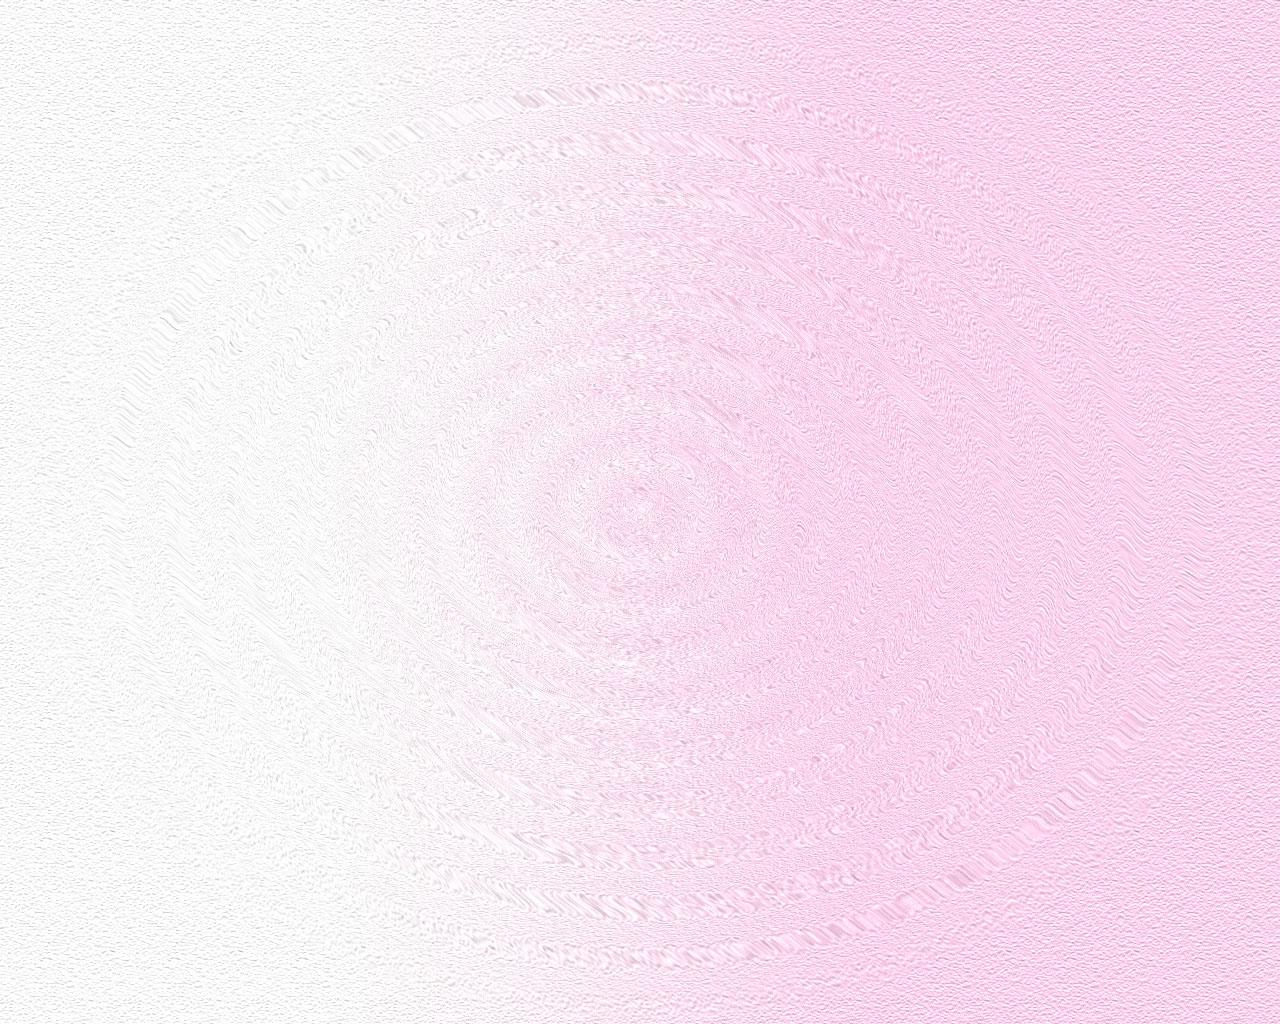 FULL WALLPAPER Baby pink wallpaper 1280x1024